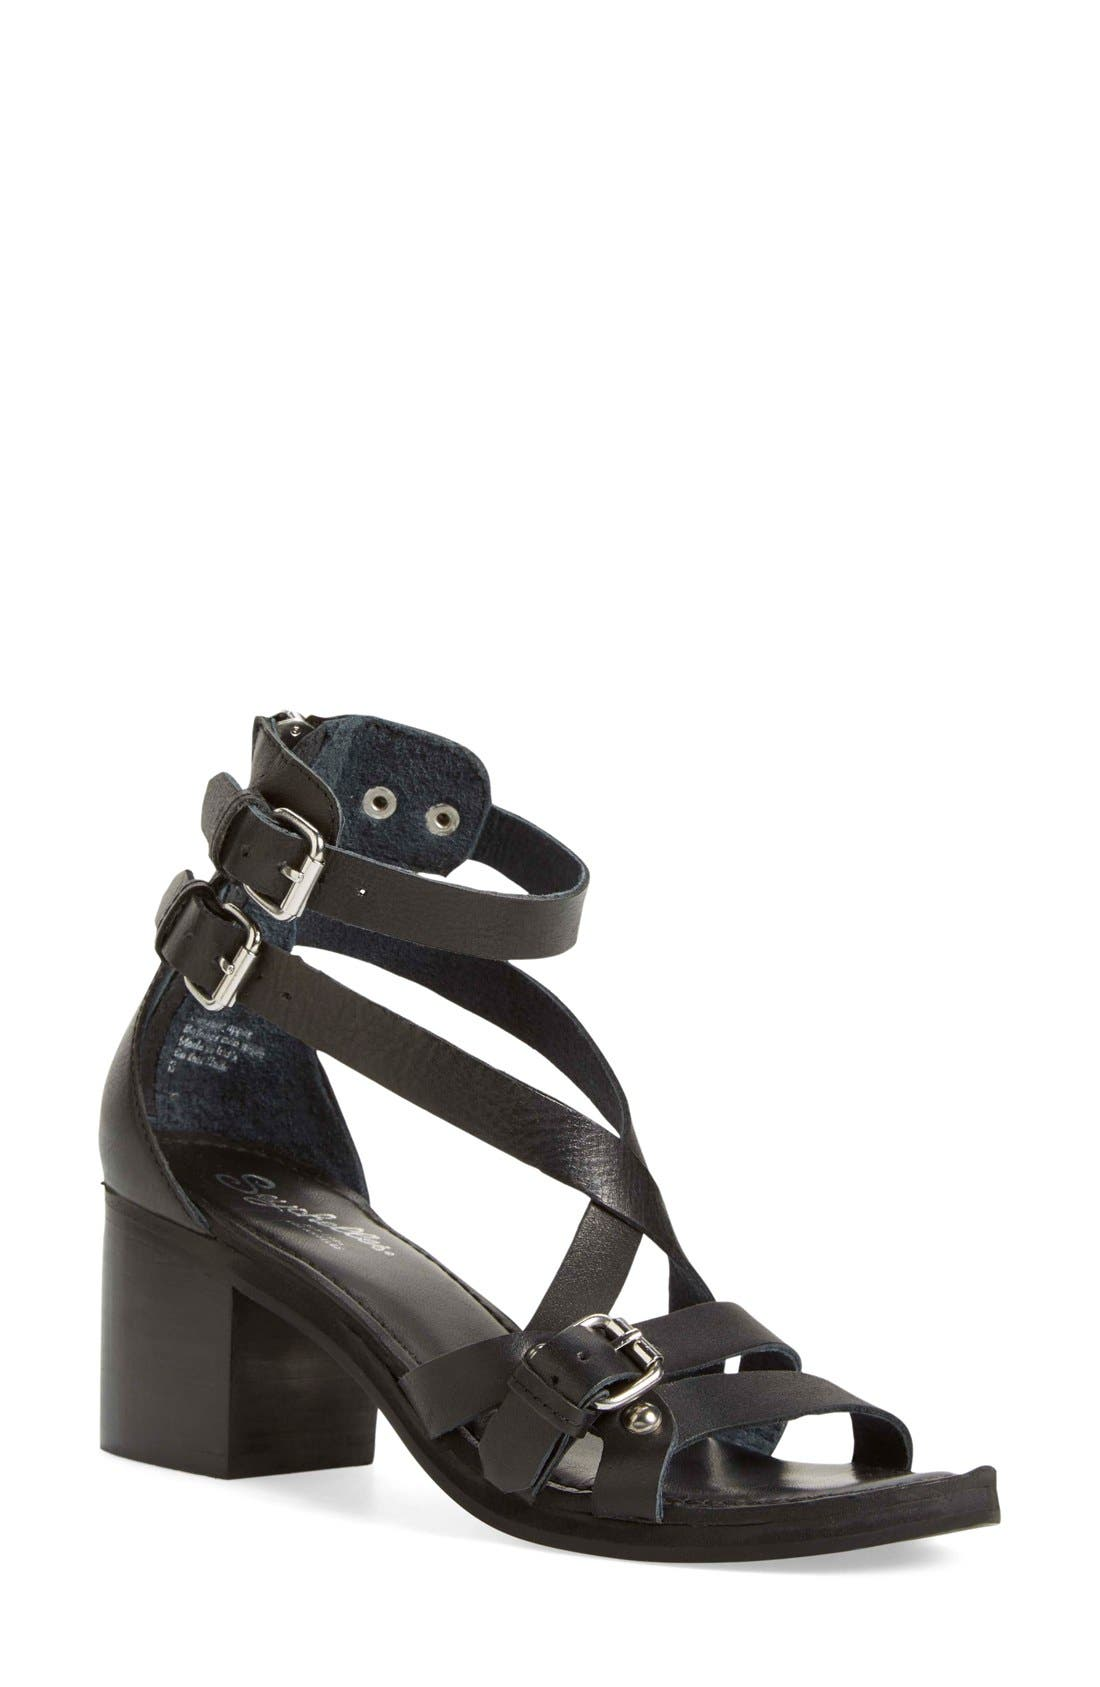 Alternate Image 1 Selected - Seychelles 'Aquarius' Ankle Strap Sandal (Women)